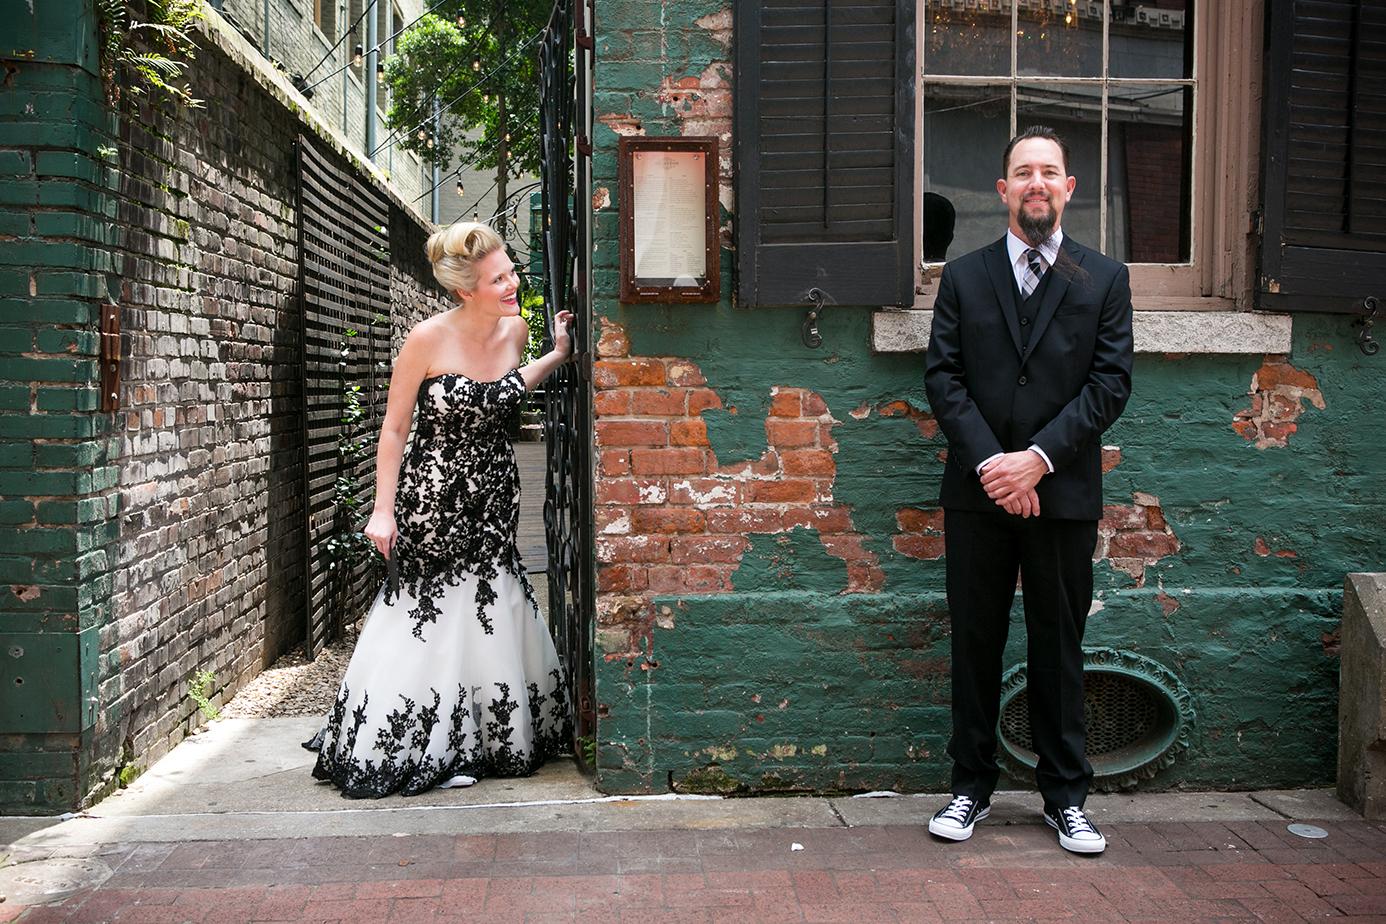 new orleans wedding photographer 2.jpg